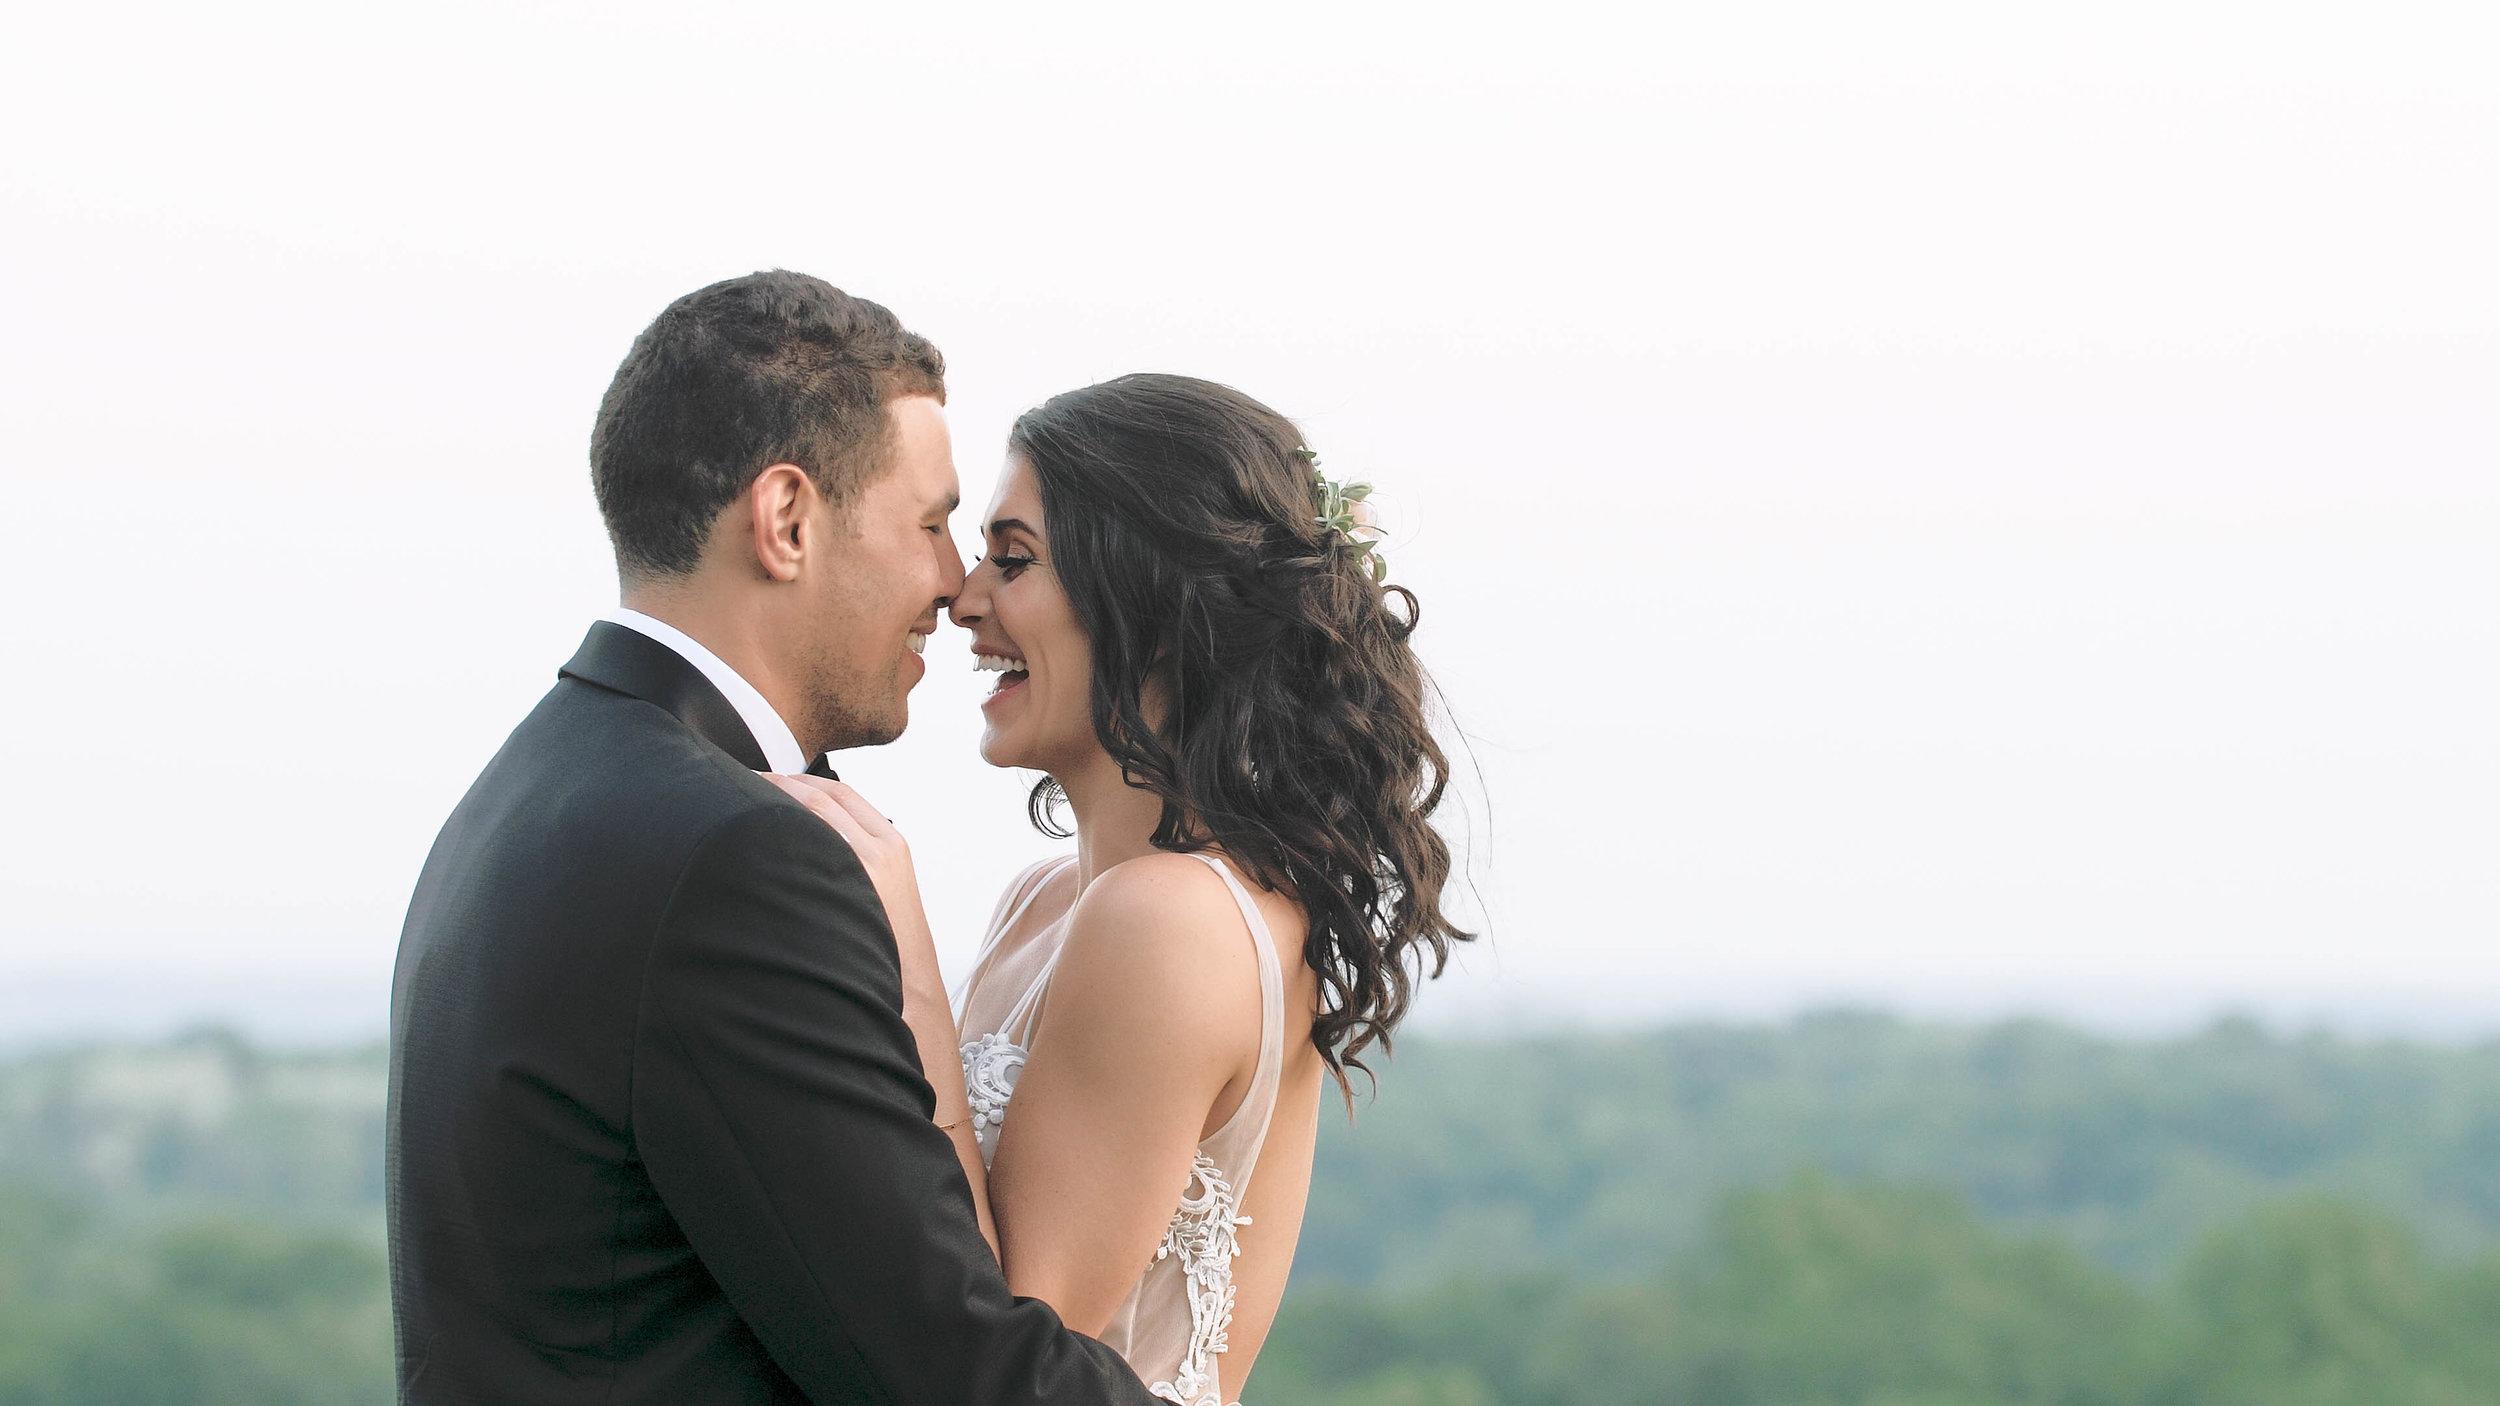 Tonemedia, NJ Wedding Videographer, NJ Wedding Videopgraphy, NJ Wedding Video, Natirar, Natirar Wedding, dreamy natirar wedding, mansion wedding, natirar mansion